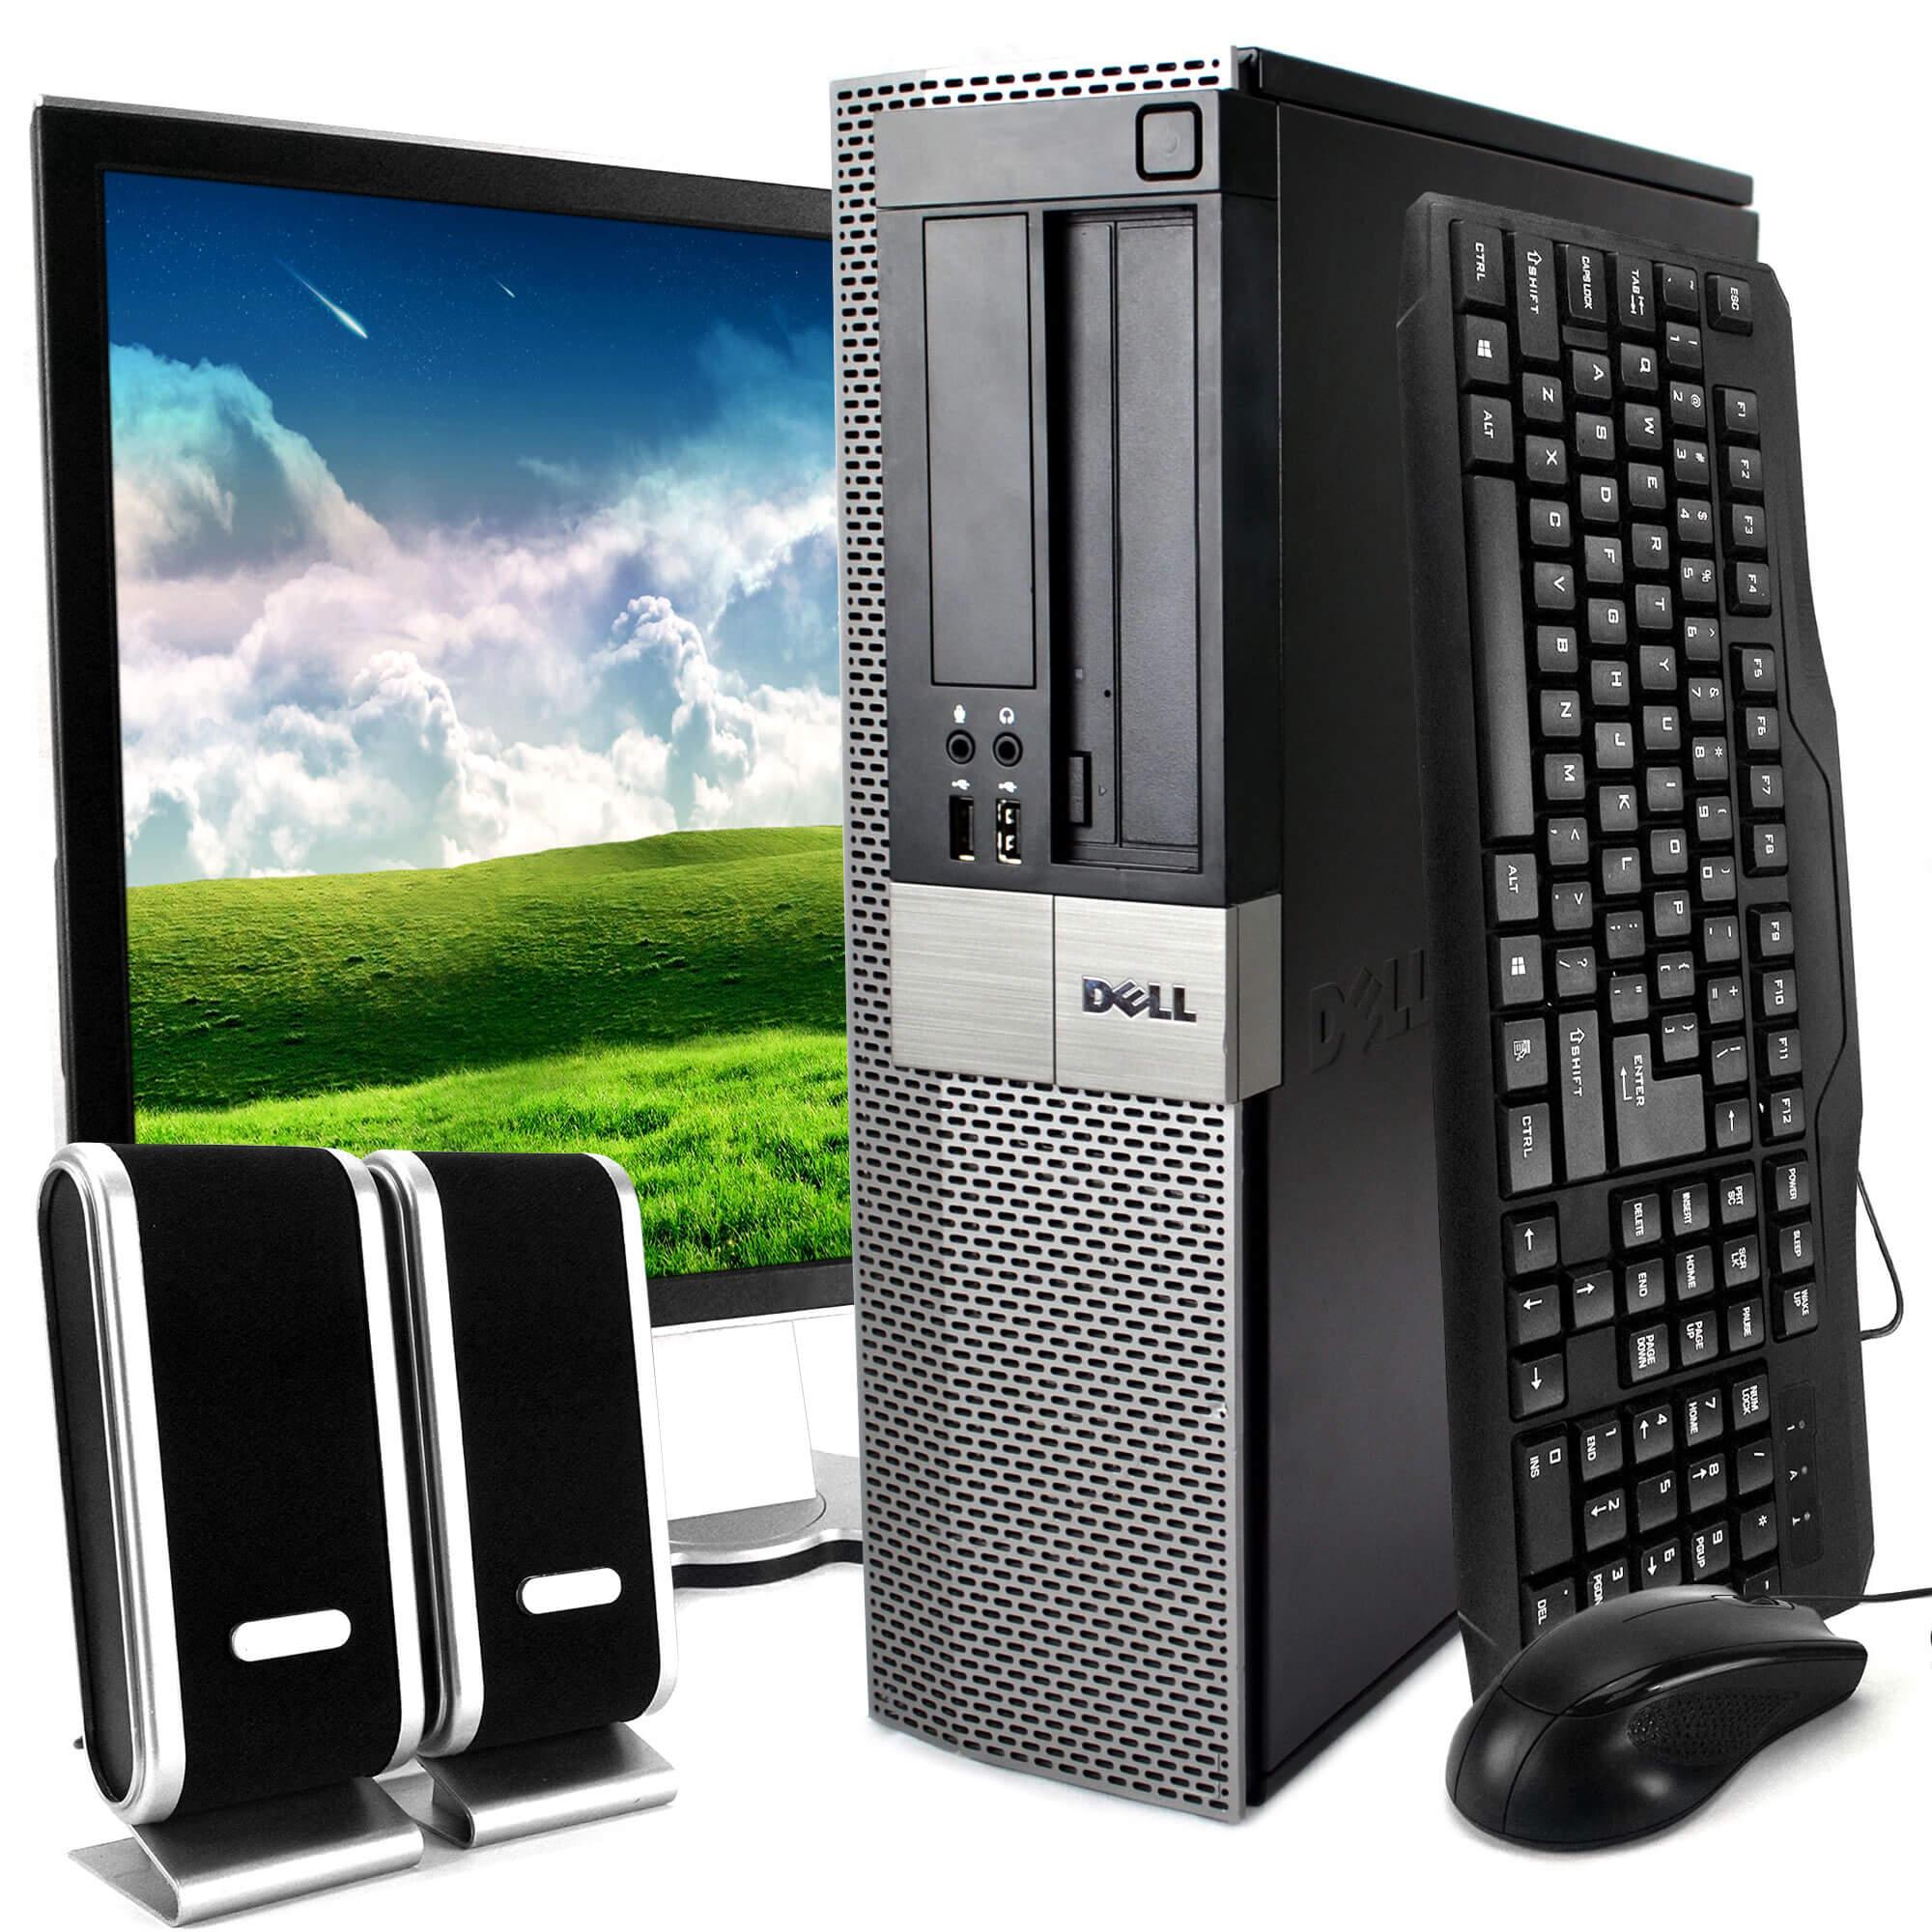 Dell Optiplex 960 Desktop Intel Core 2 Duo 3.0GHz 8GB RAM 1TB HDD DVD-ROM Windows 10 Home 19'' Display Keyboard Mouse Speaker WiFi